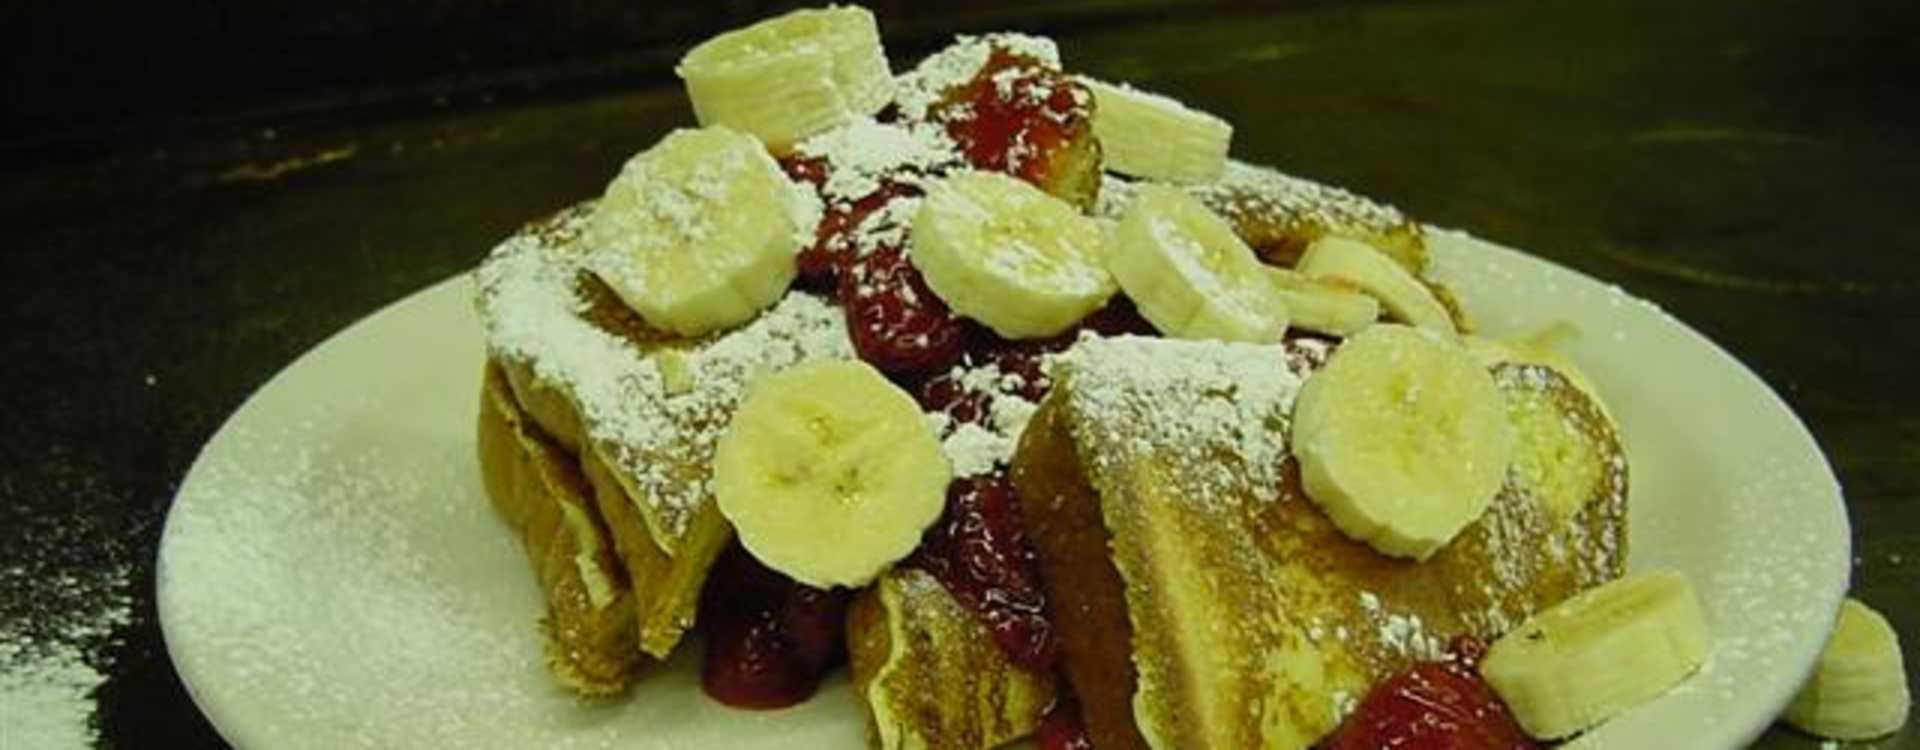 Pancake_Chef-8.jpg